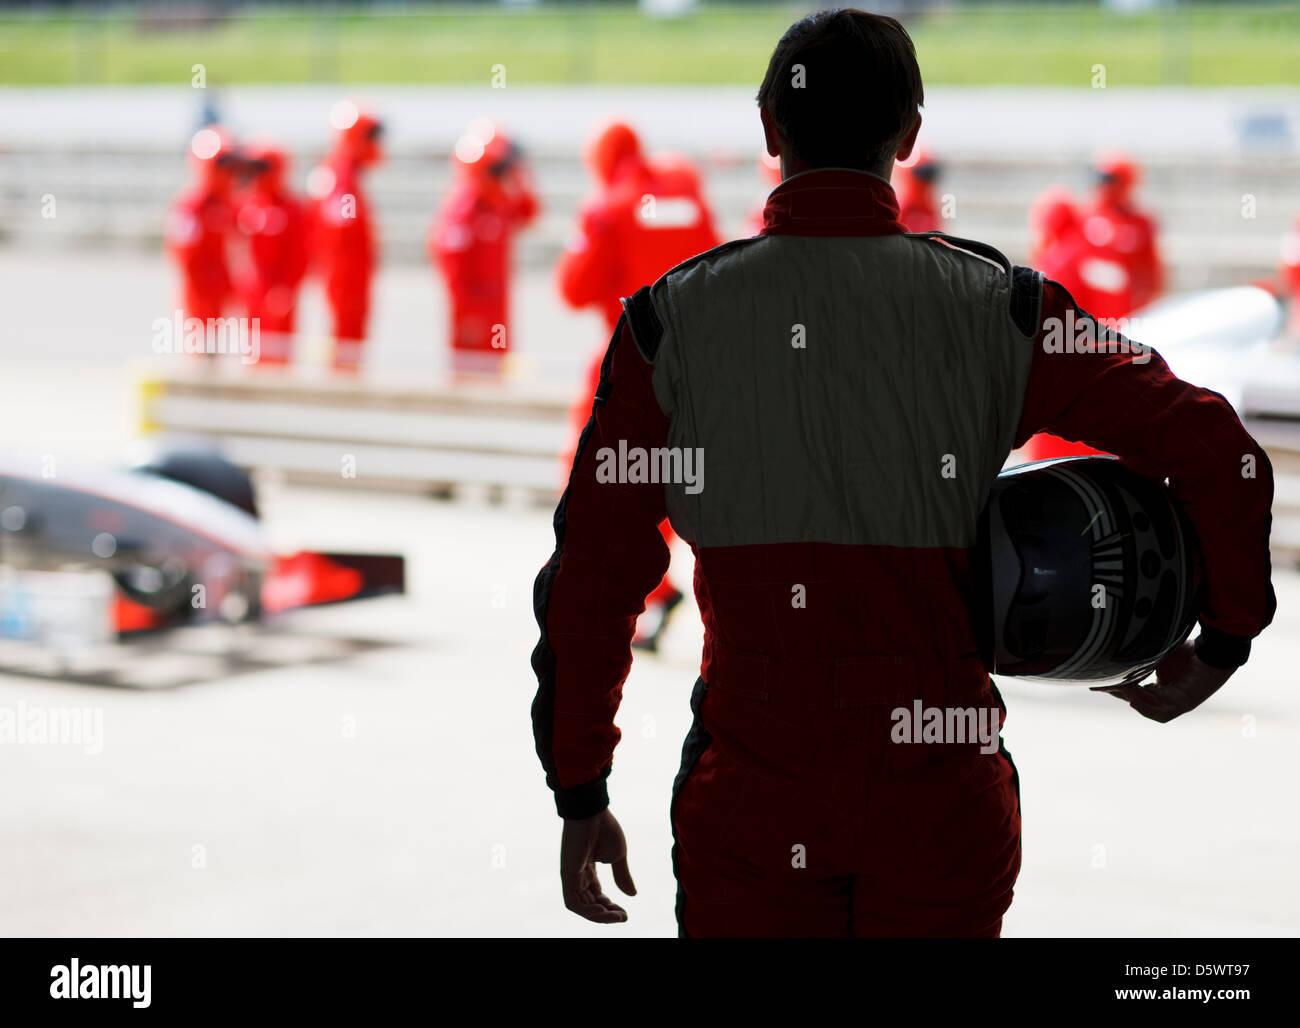 Racer carrying helmet on sidelines - Stock Image